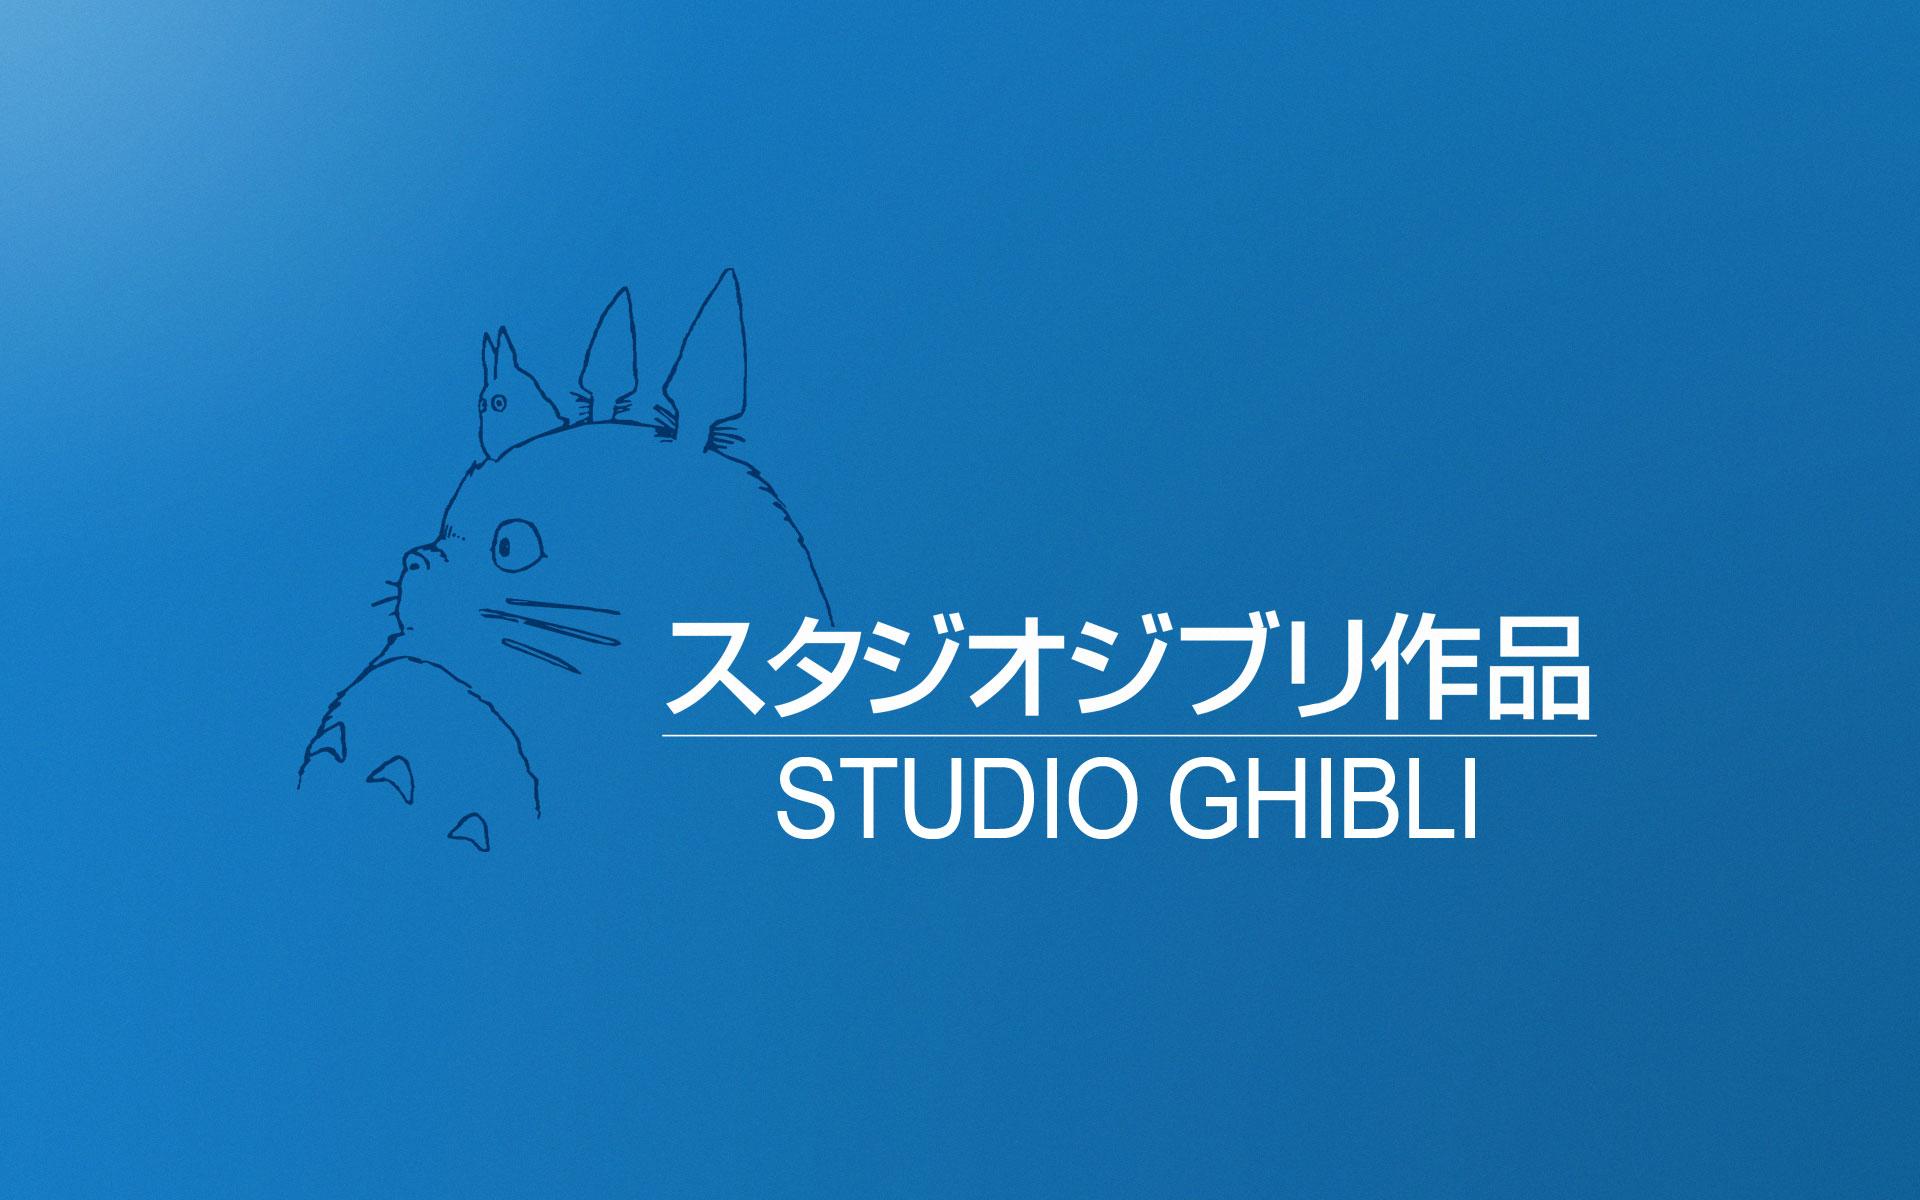 Les studios Ghibli, c'est fini ? Studio10